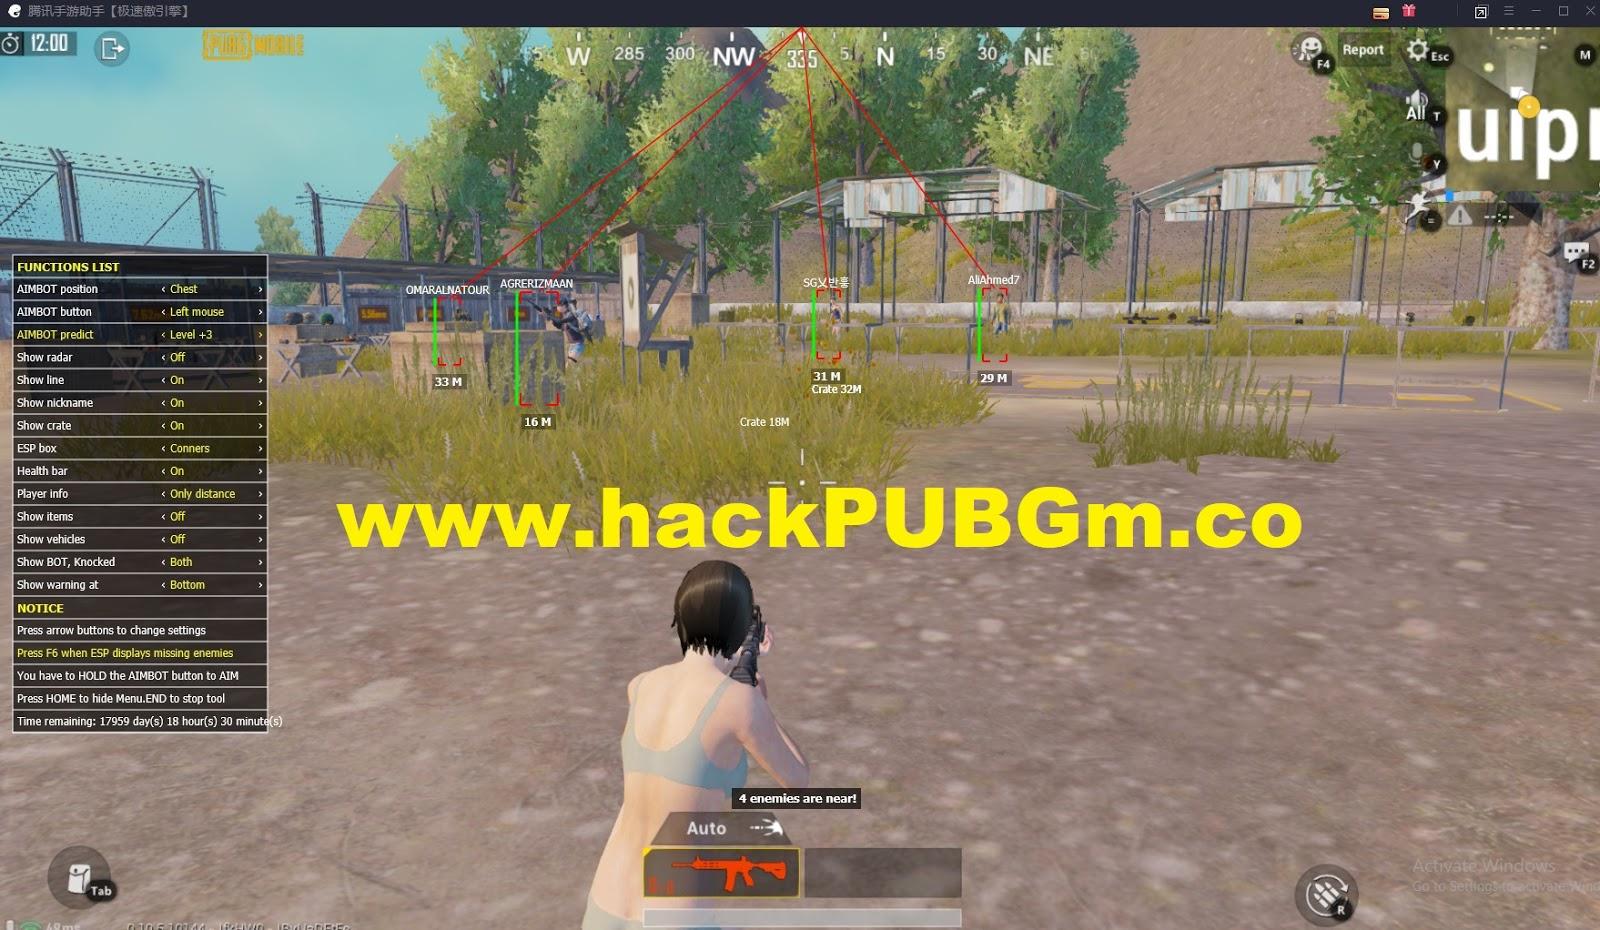 v3 2 - Hack PUBG Mobile PC | Hack PUBG Giả Lập Mới Nhất | Hack Wall